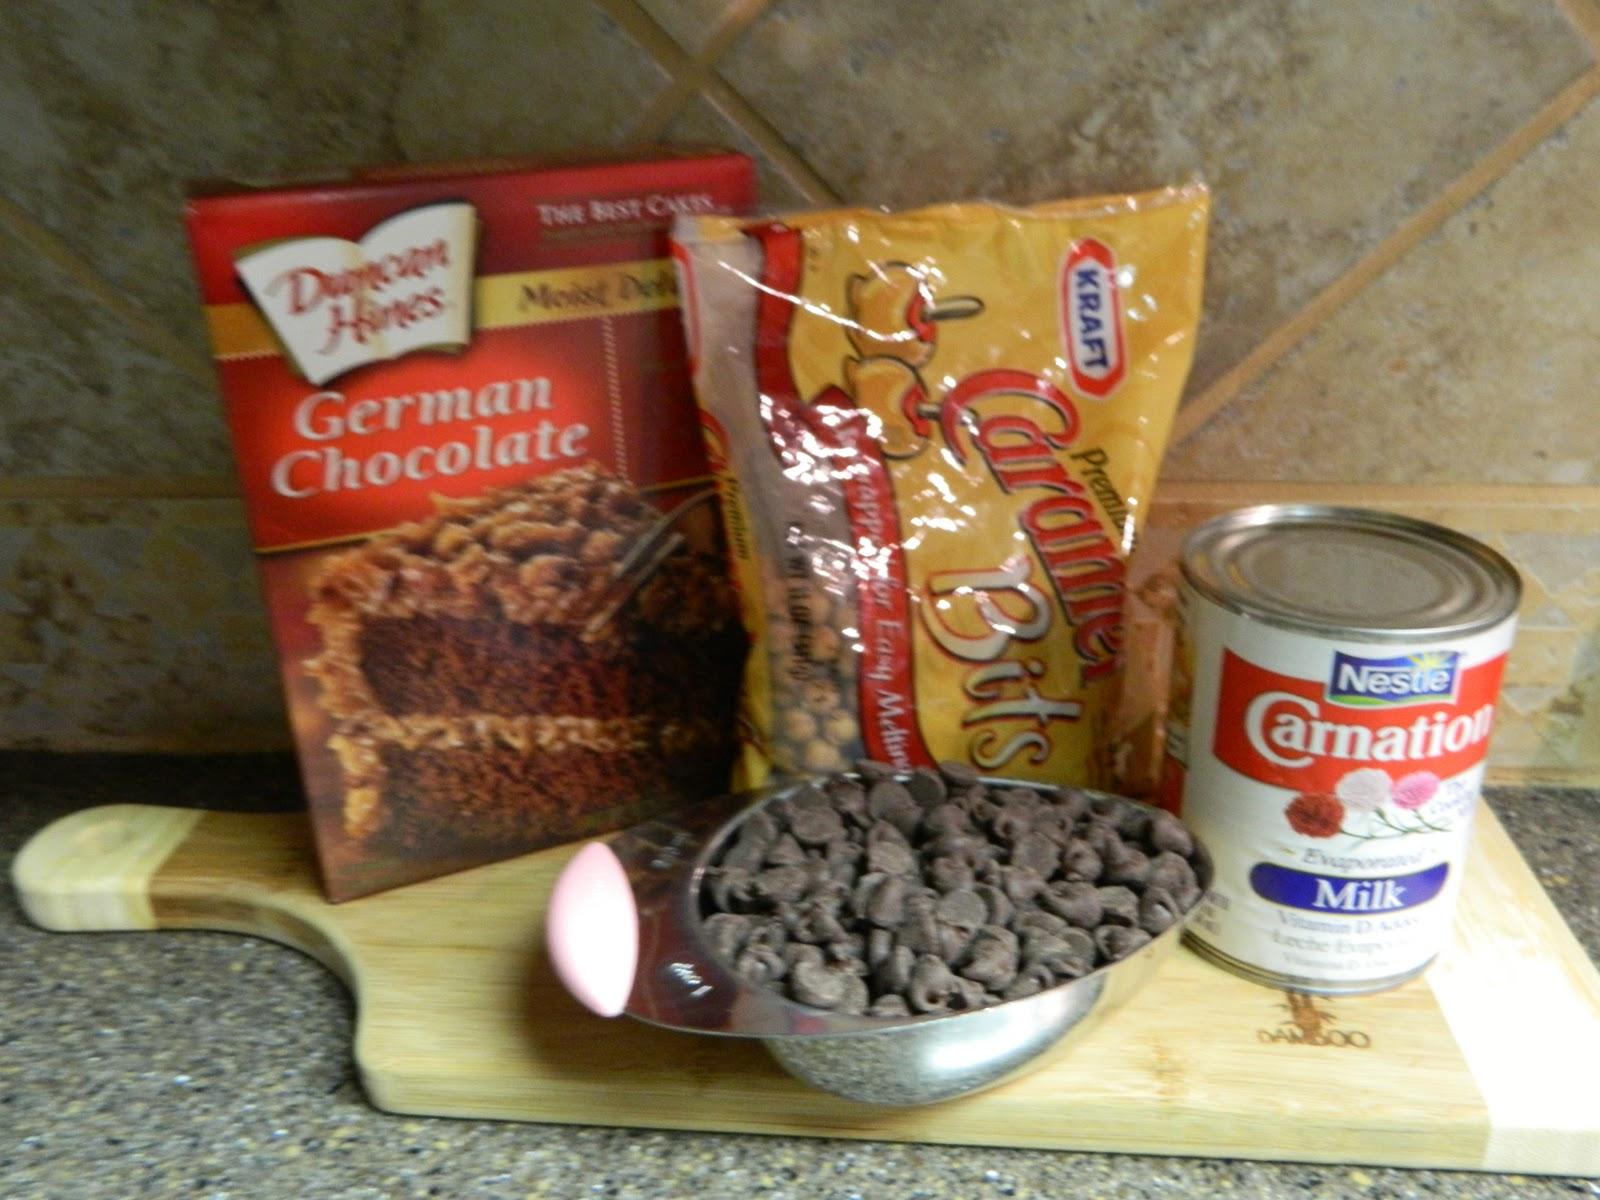 Can U Use Cake Mix To Make Brownies